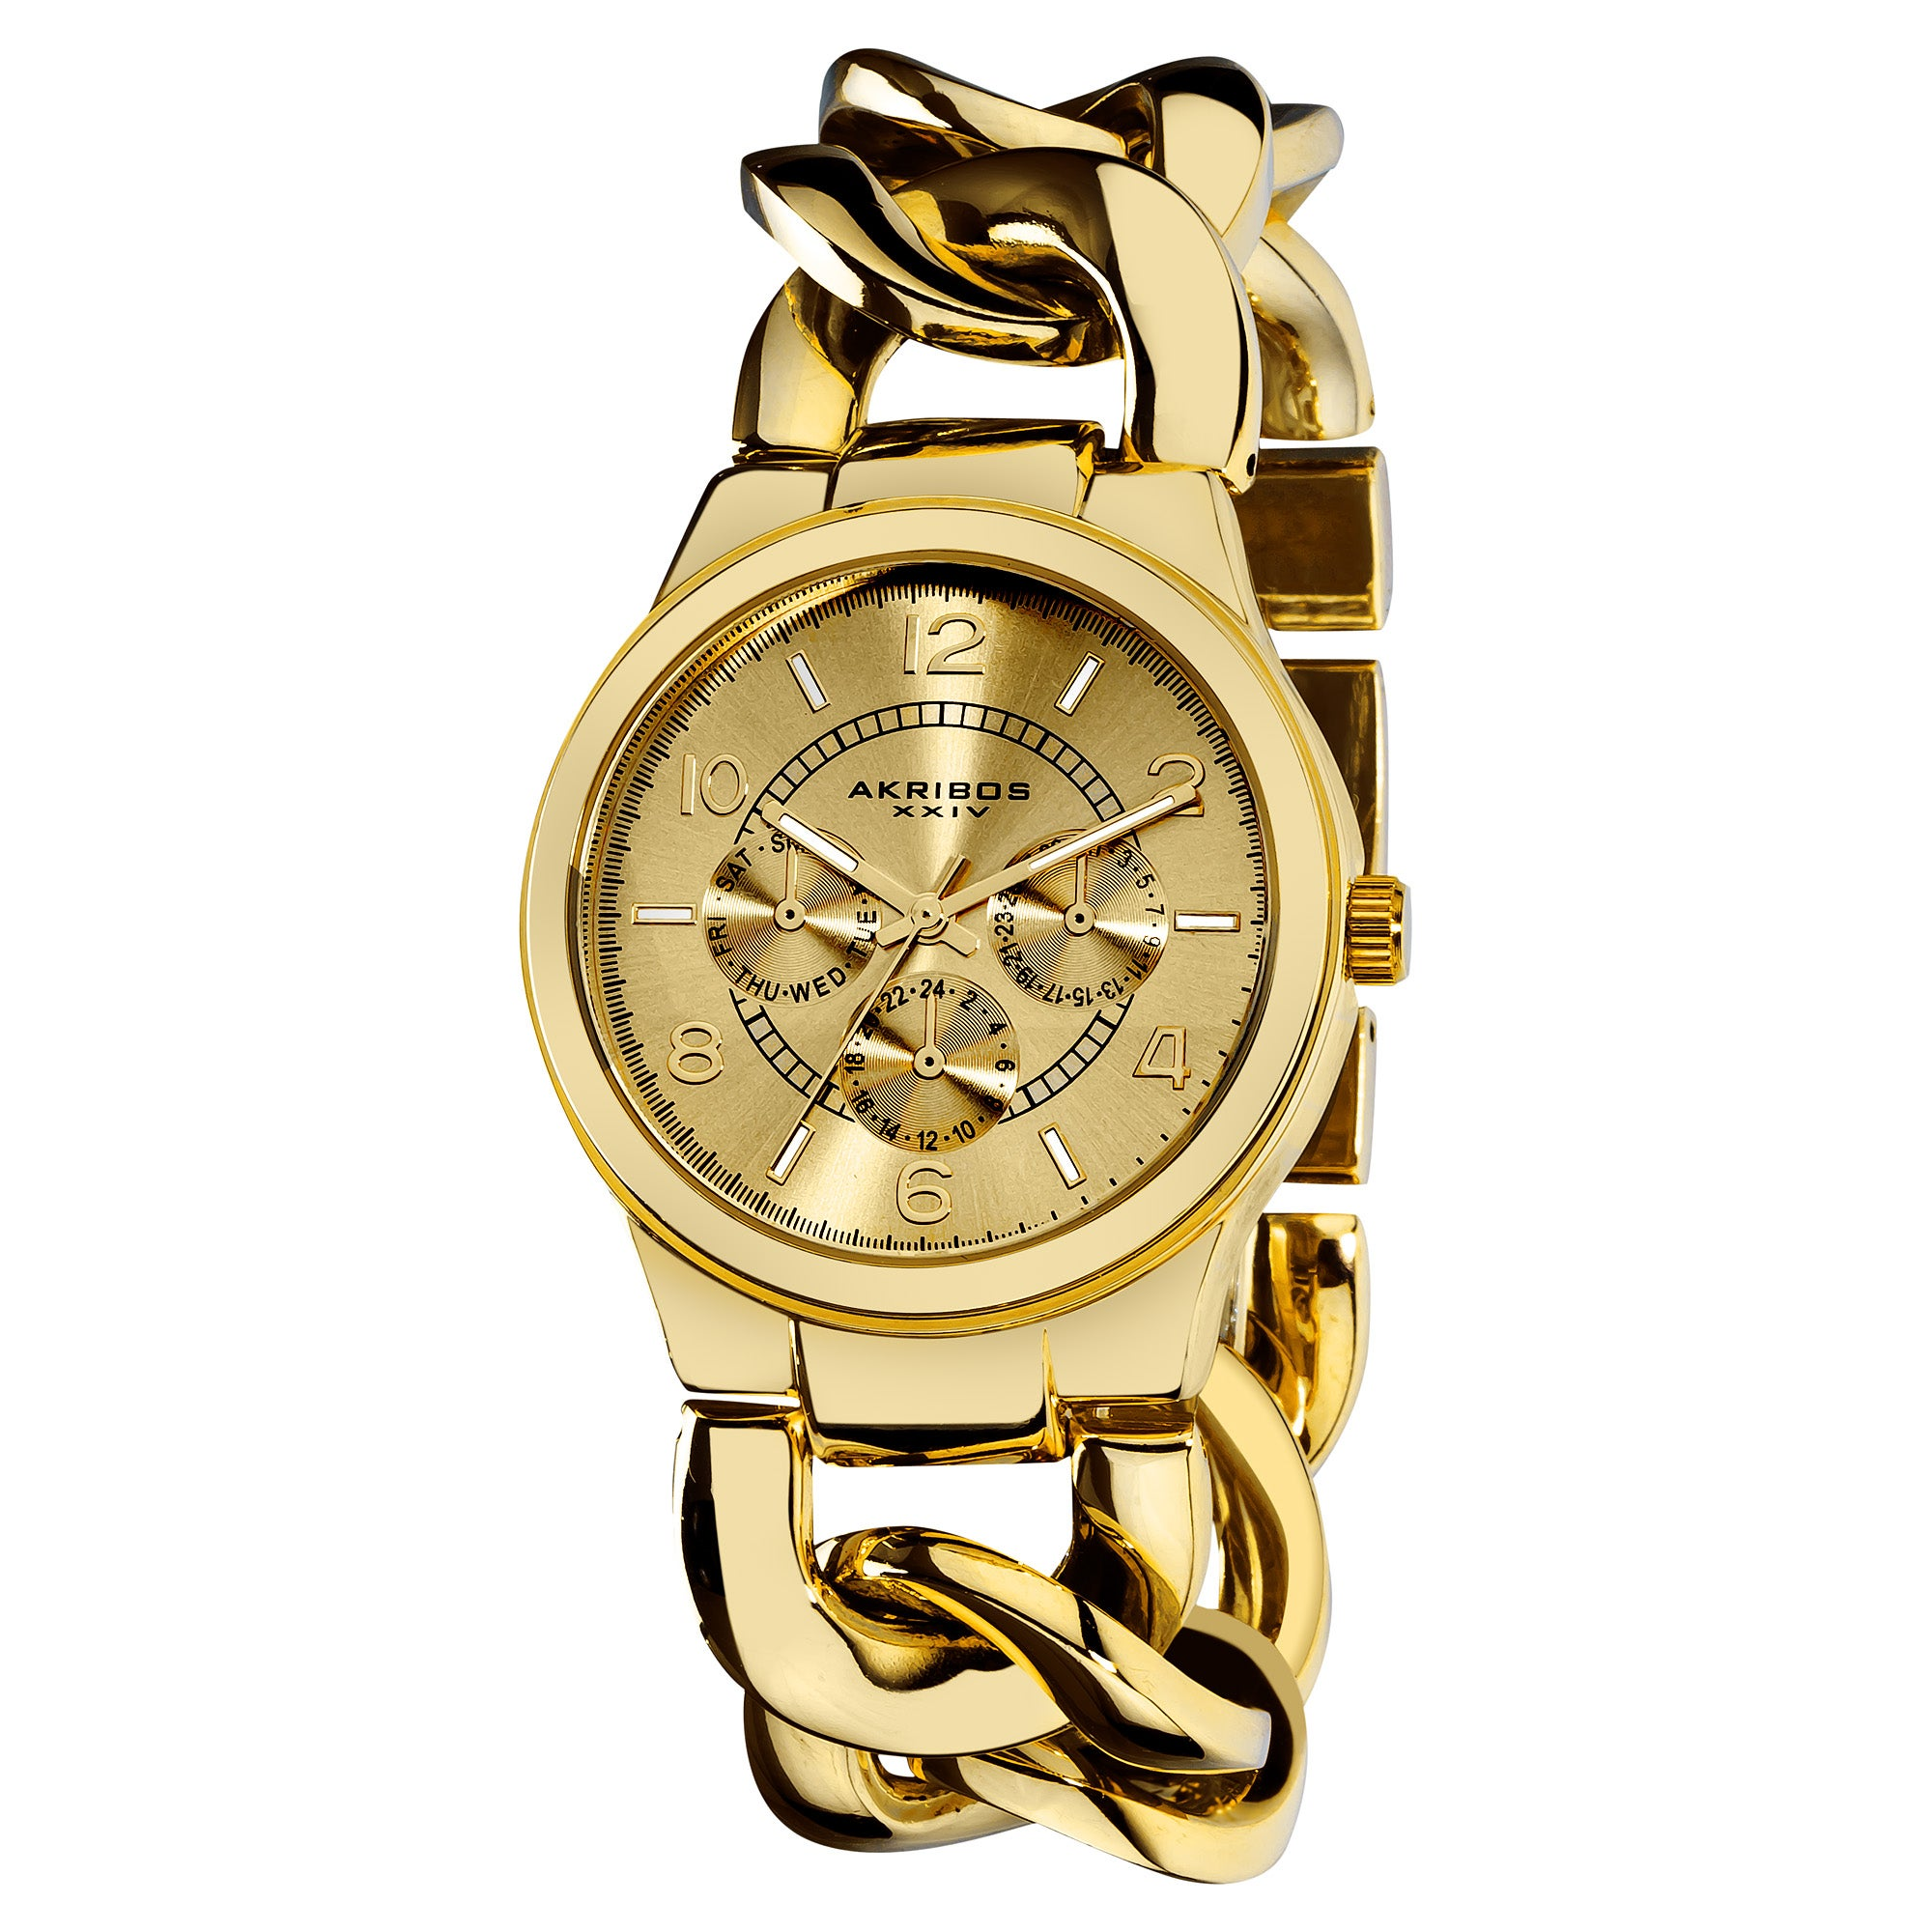 Akribos XXIV Women's Twist-Chain Japanese-Quartz Multifunction Watch